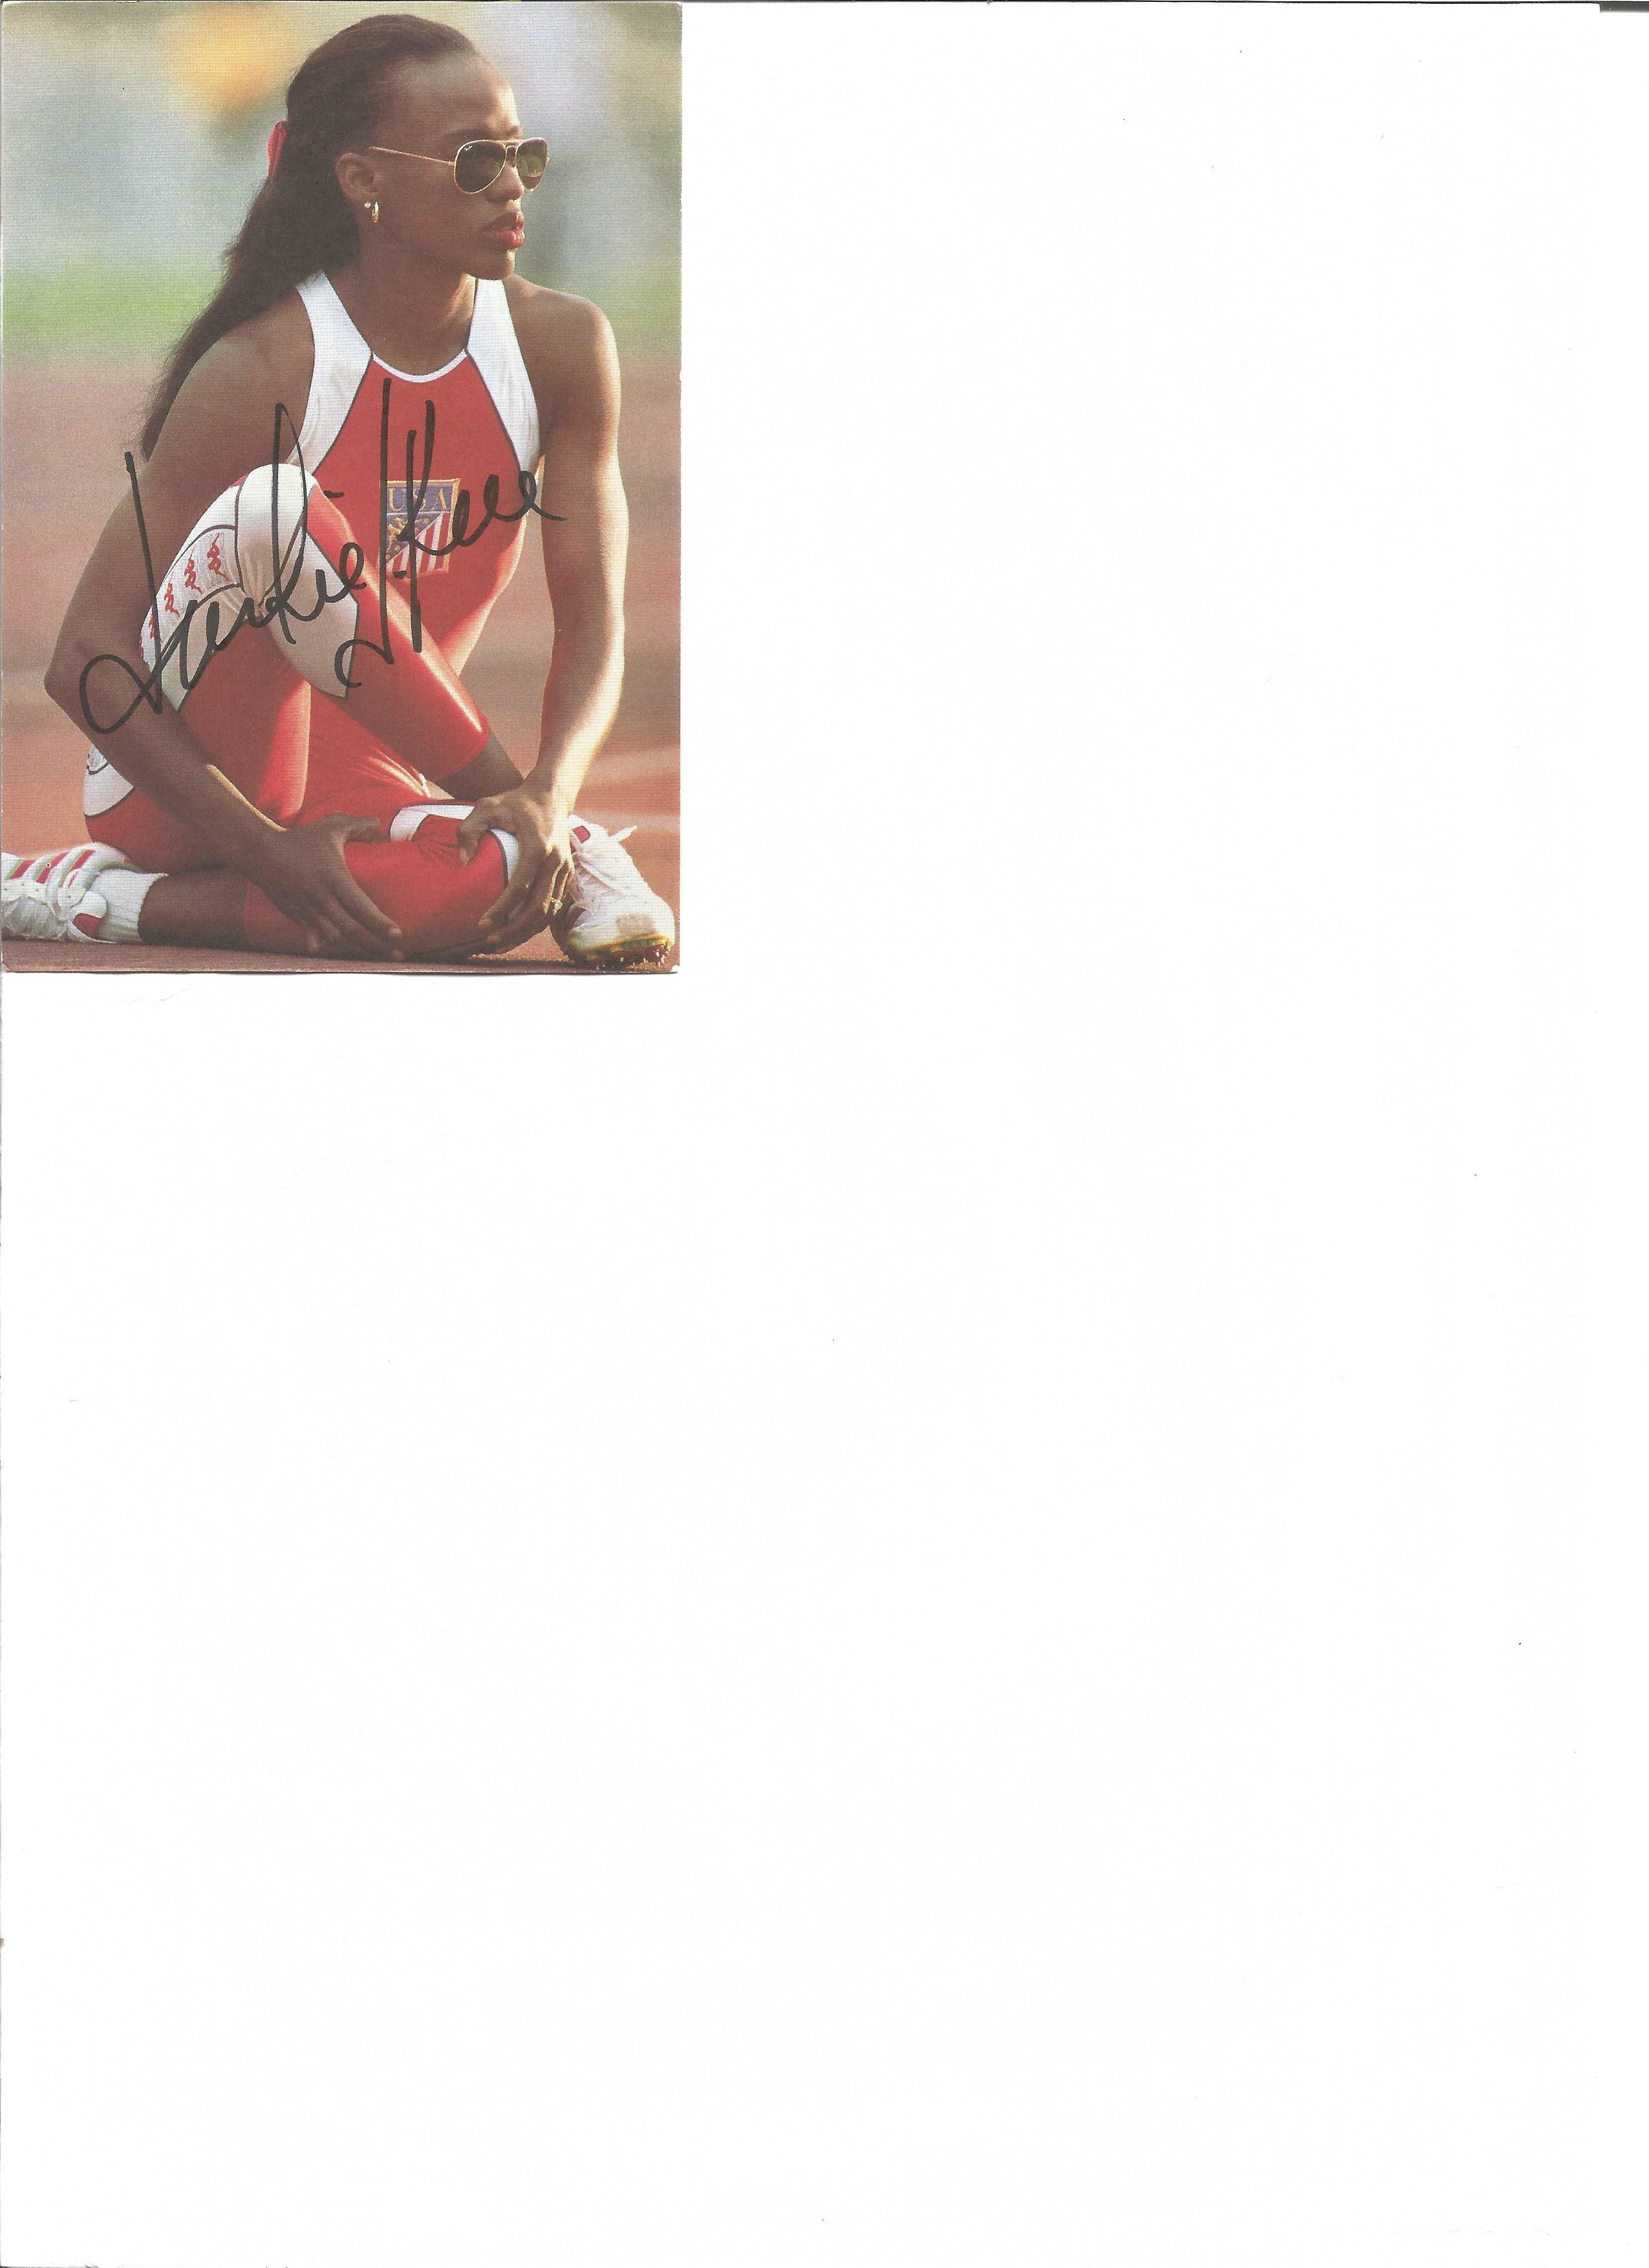 Lot 161 - Athletics Jackie Joyner-Kersee 5x4 signed colour photo. Jacqueline Joyner-Kersee born March 3,